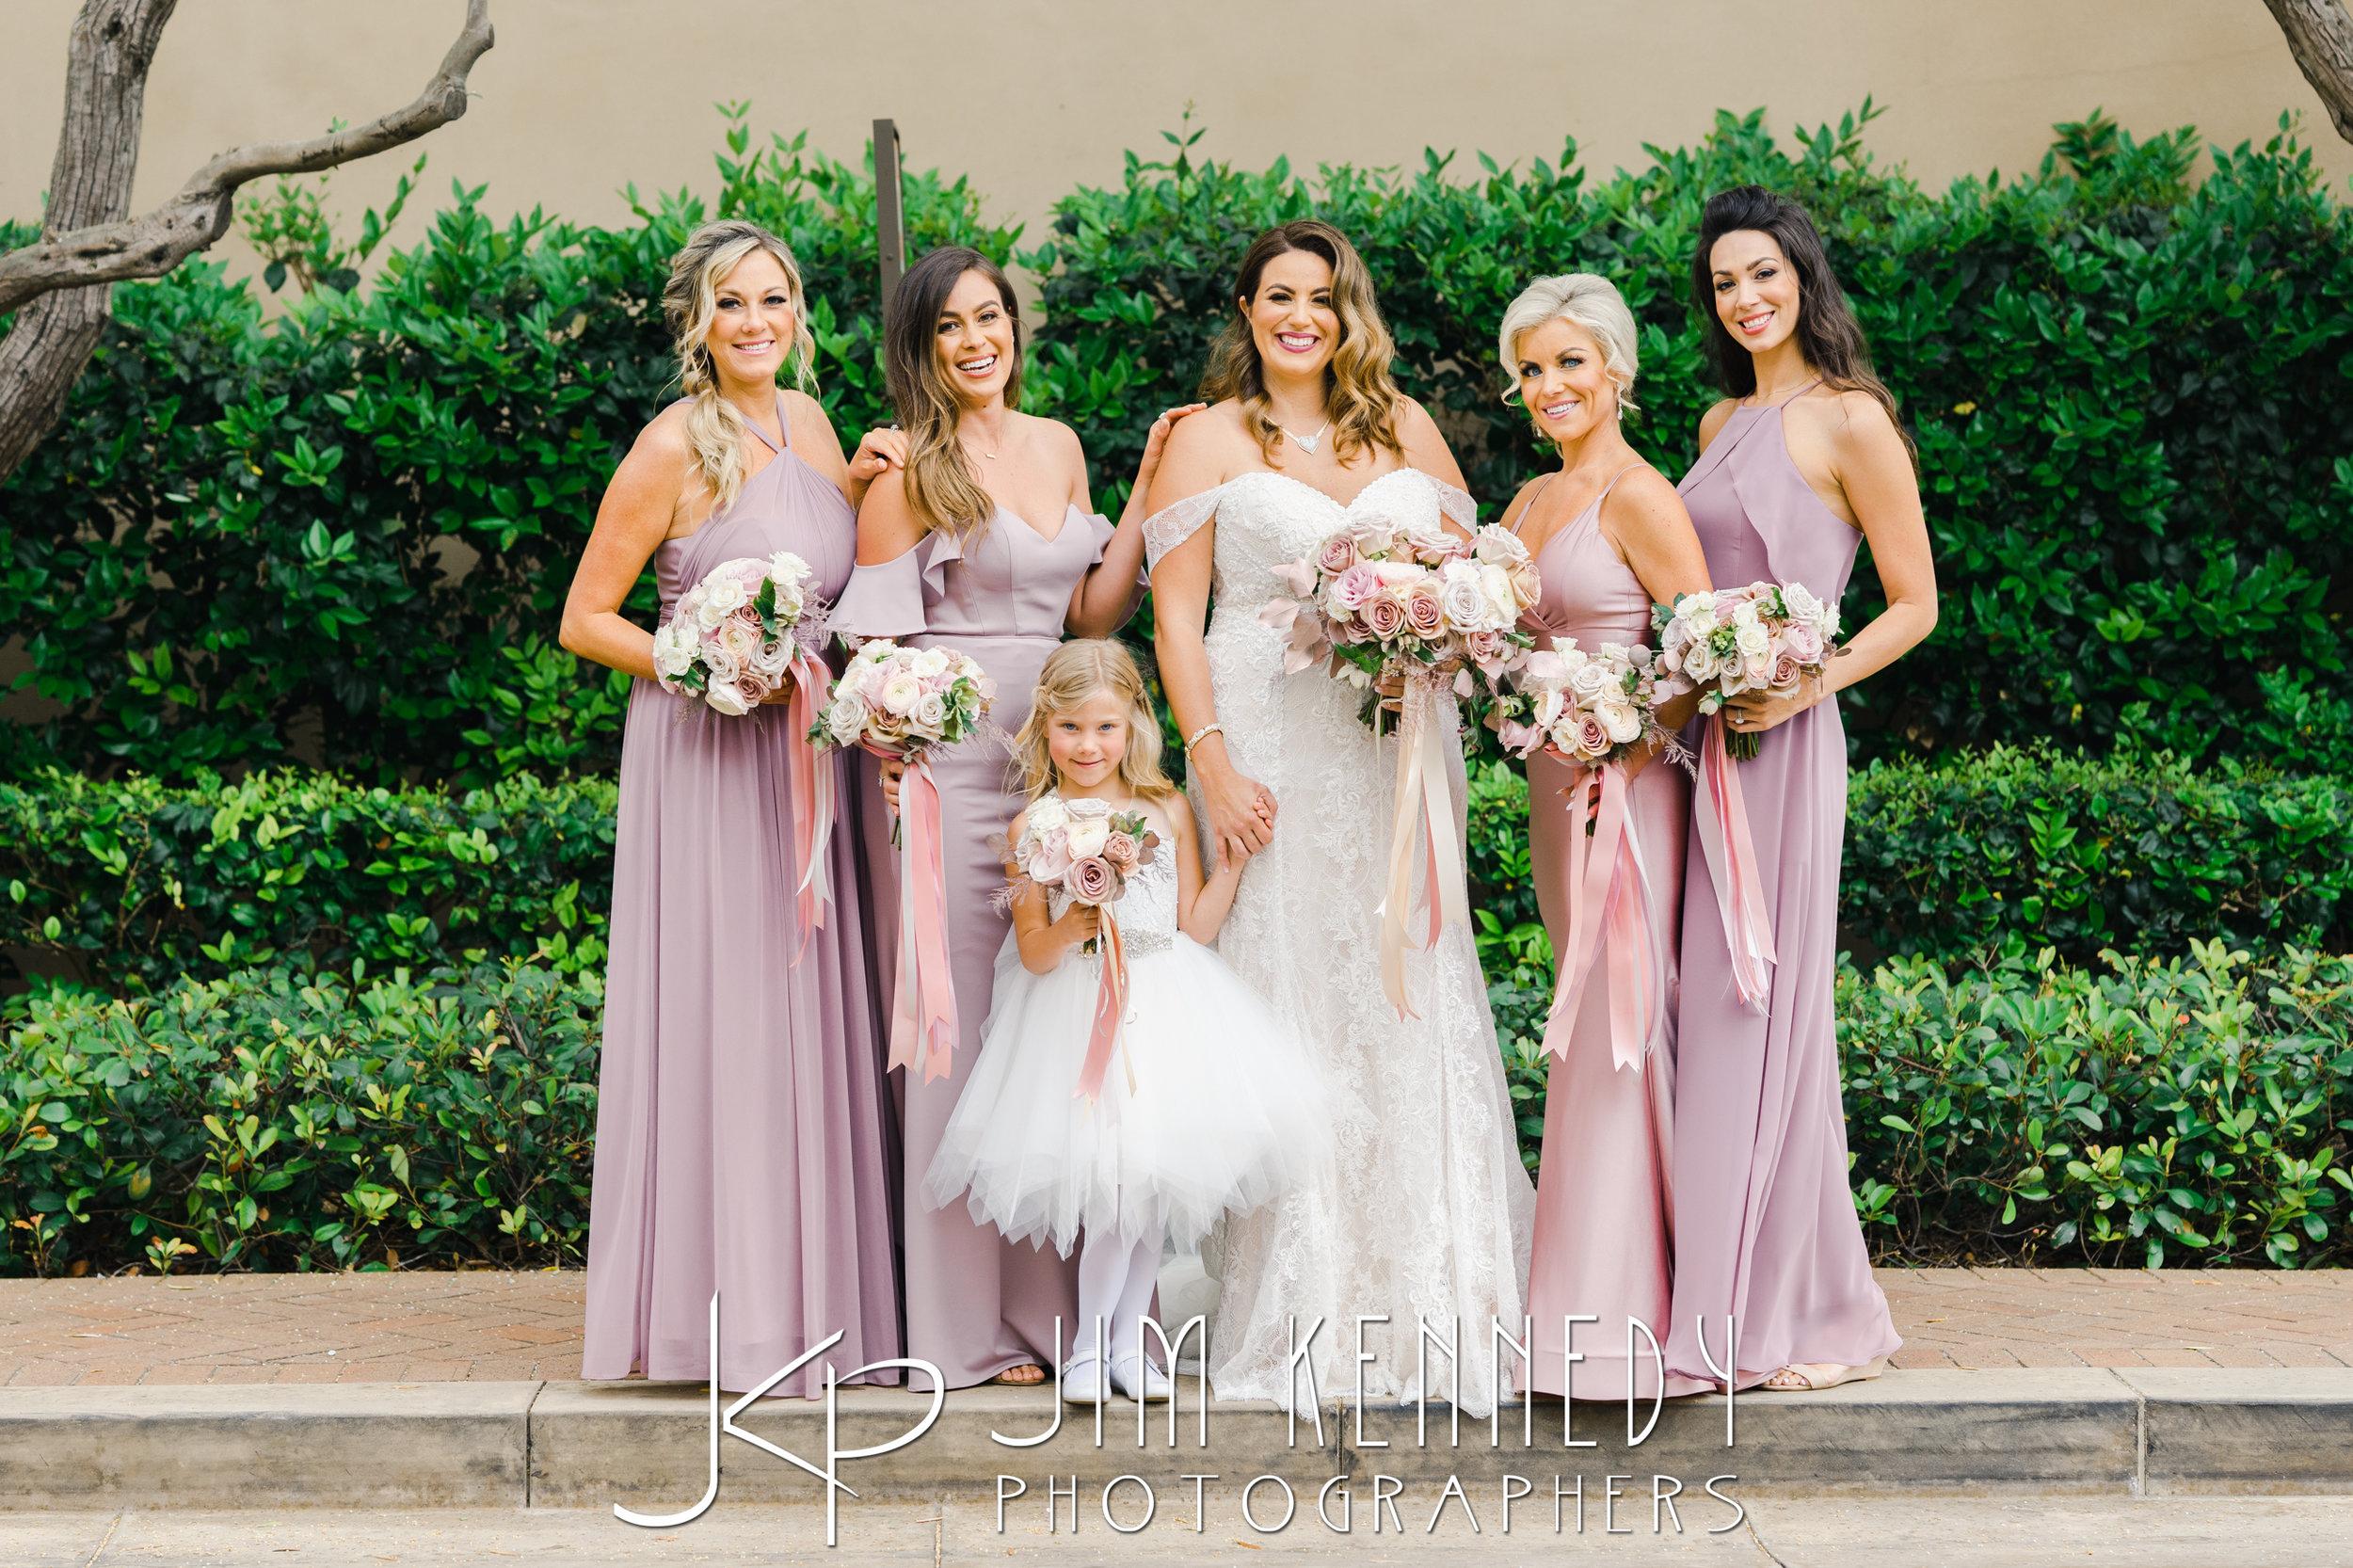 pelican-hill-wedding-jim-kenedy-photographers_0054.JPG